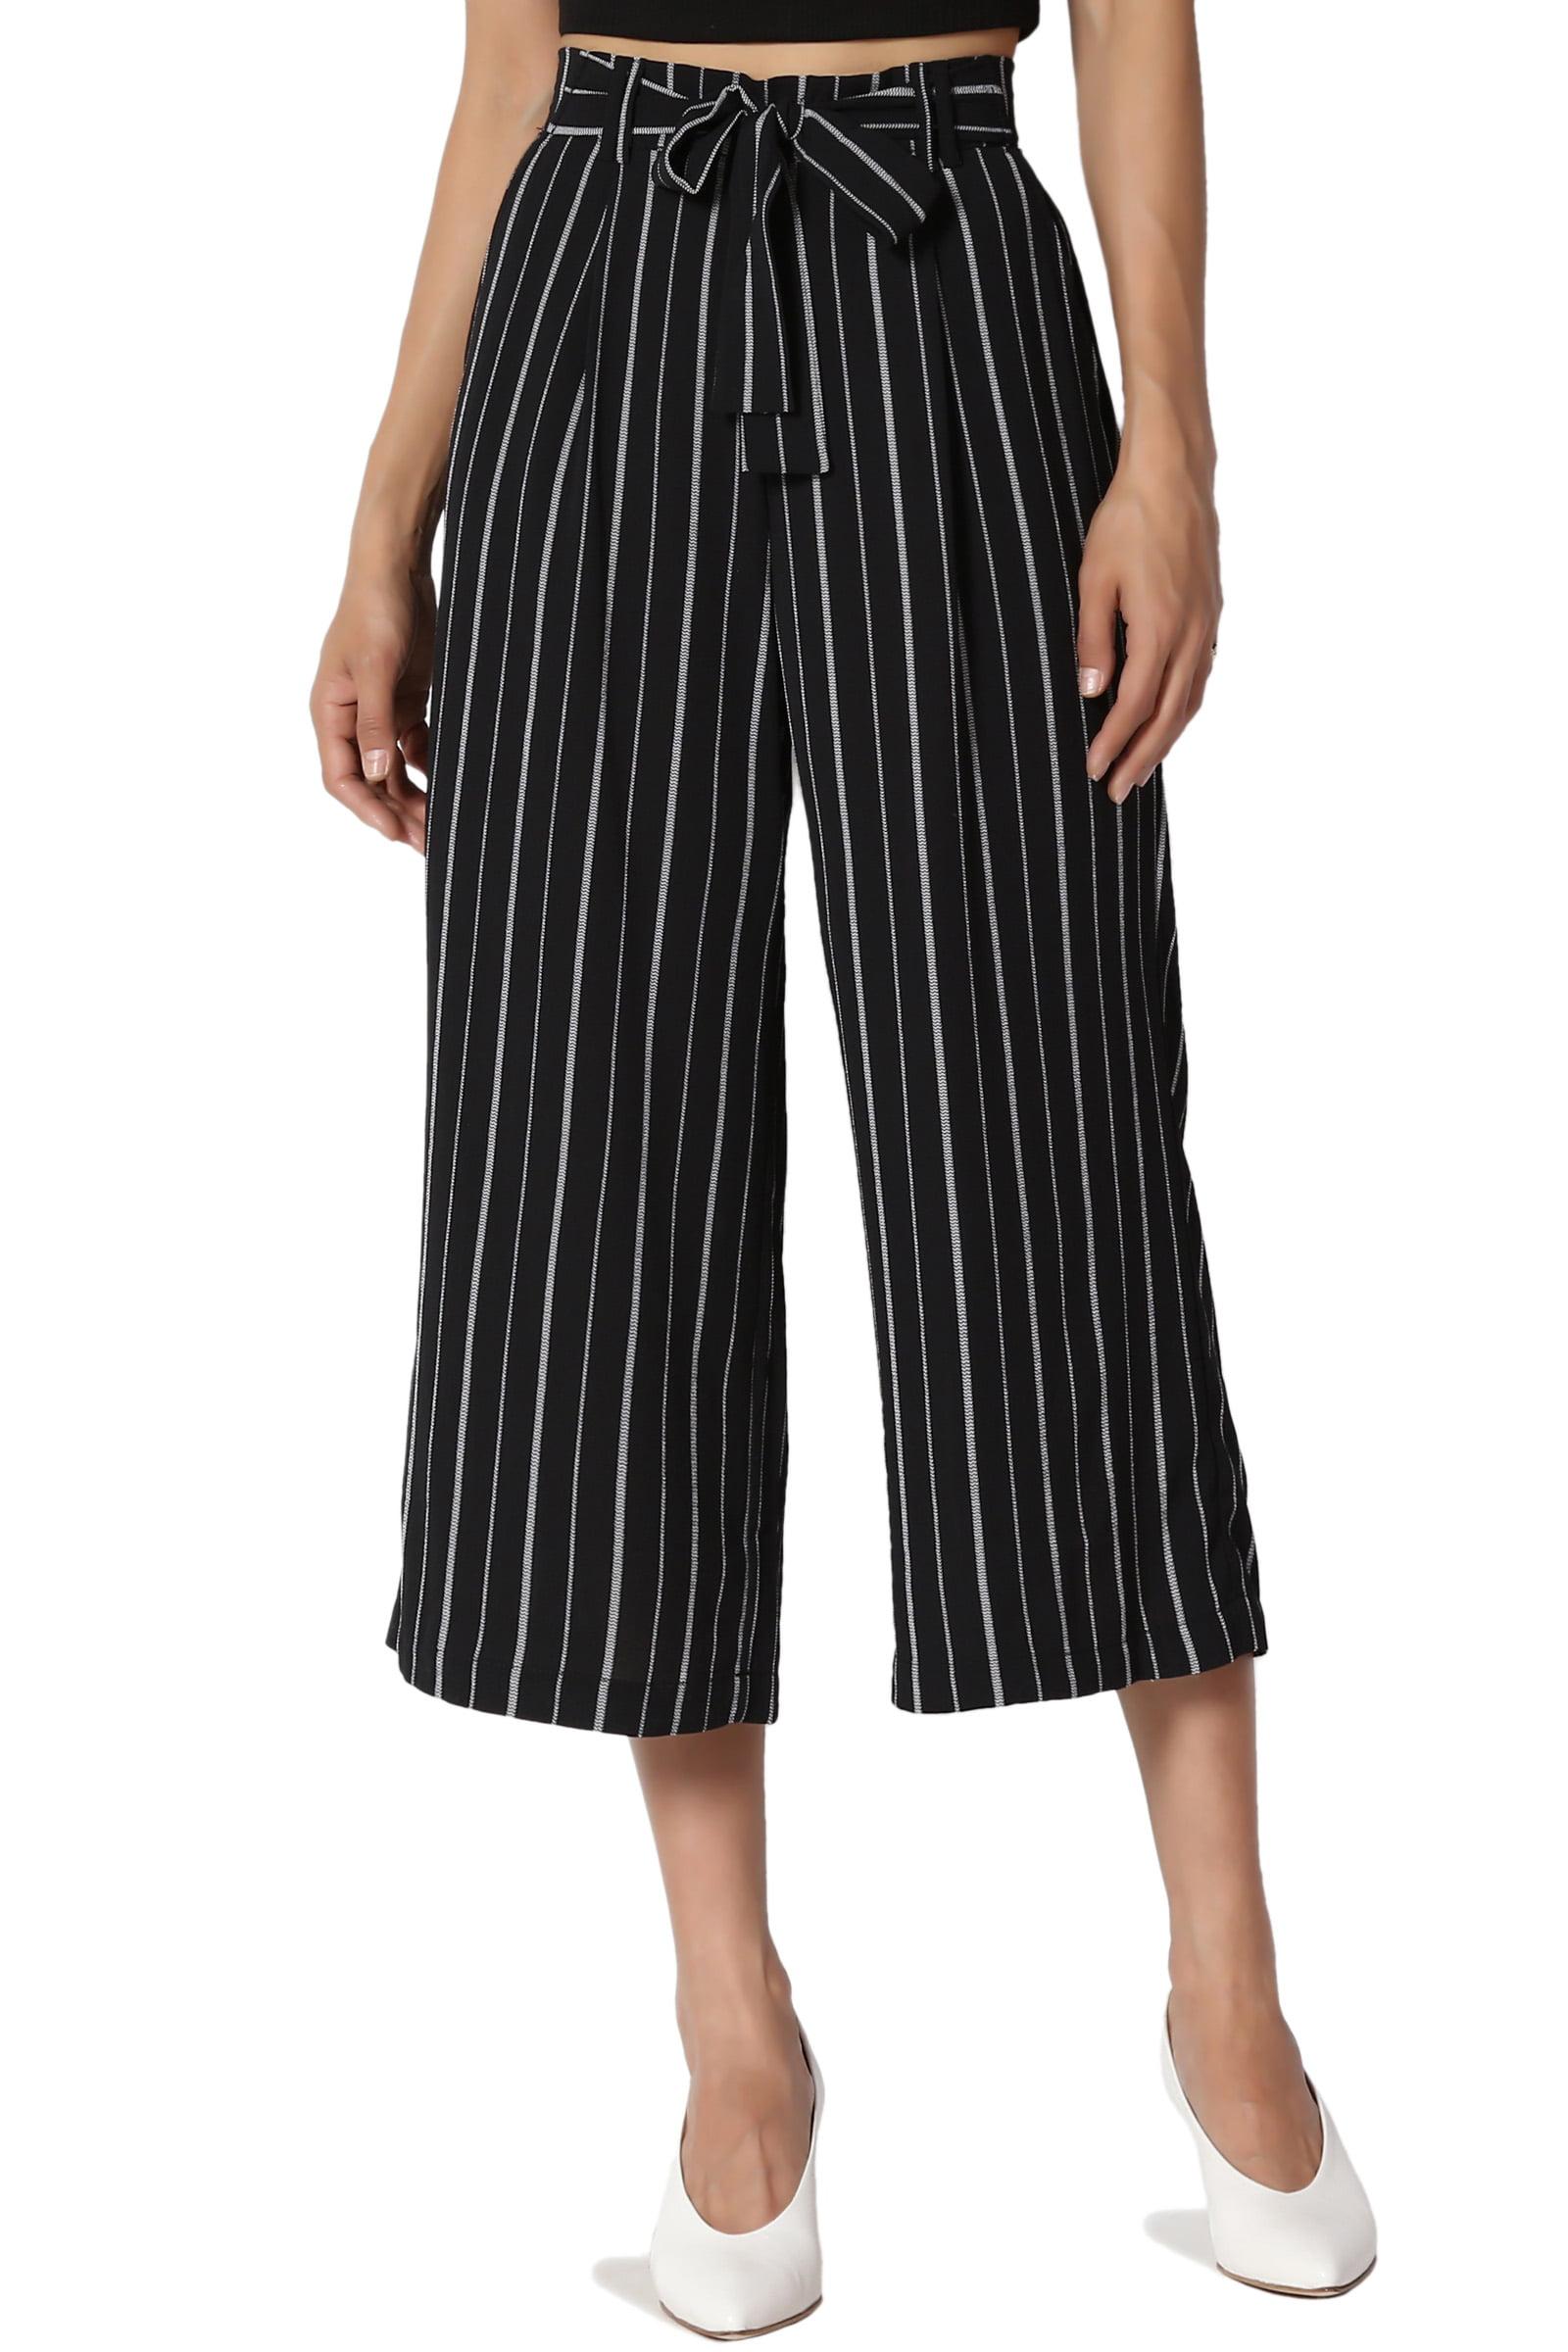 TheMogan Junior's Tie Front Stripe Elastic Back High Waist Wide leg Crop Pants